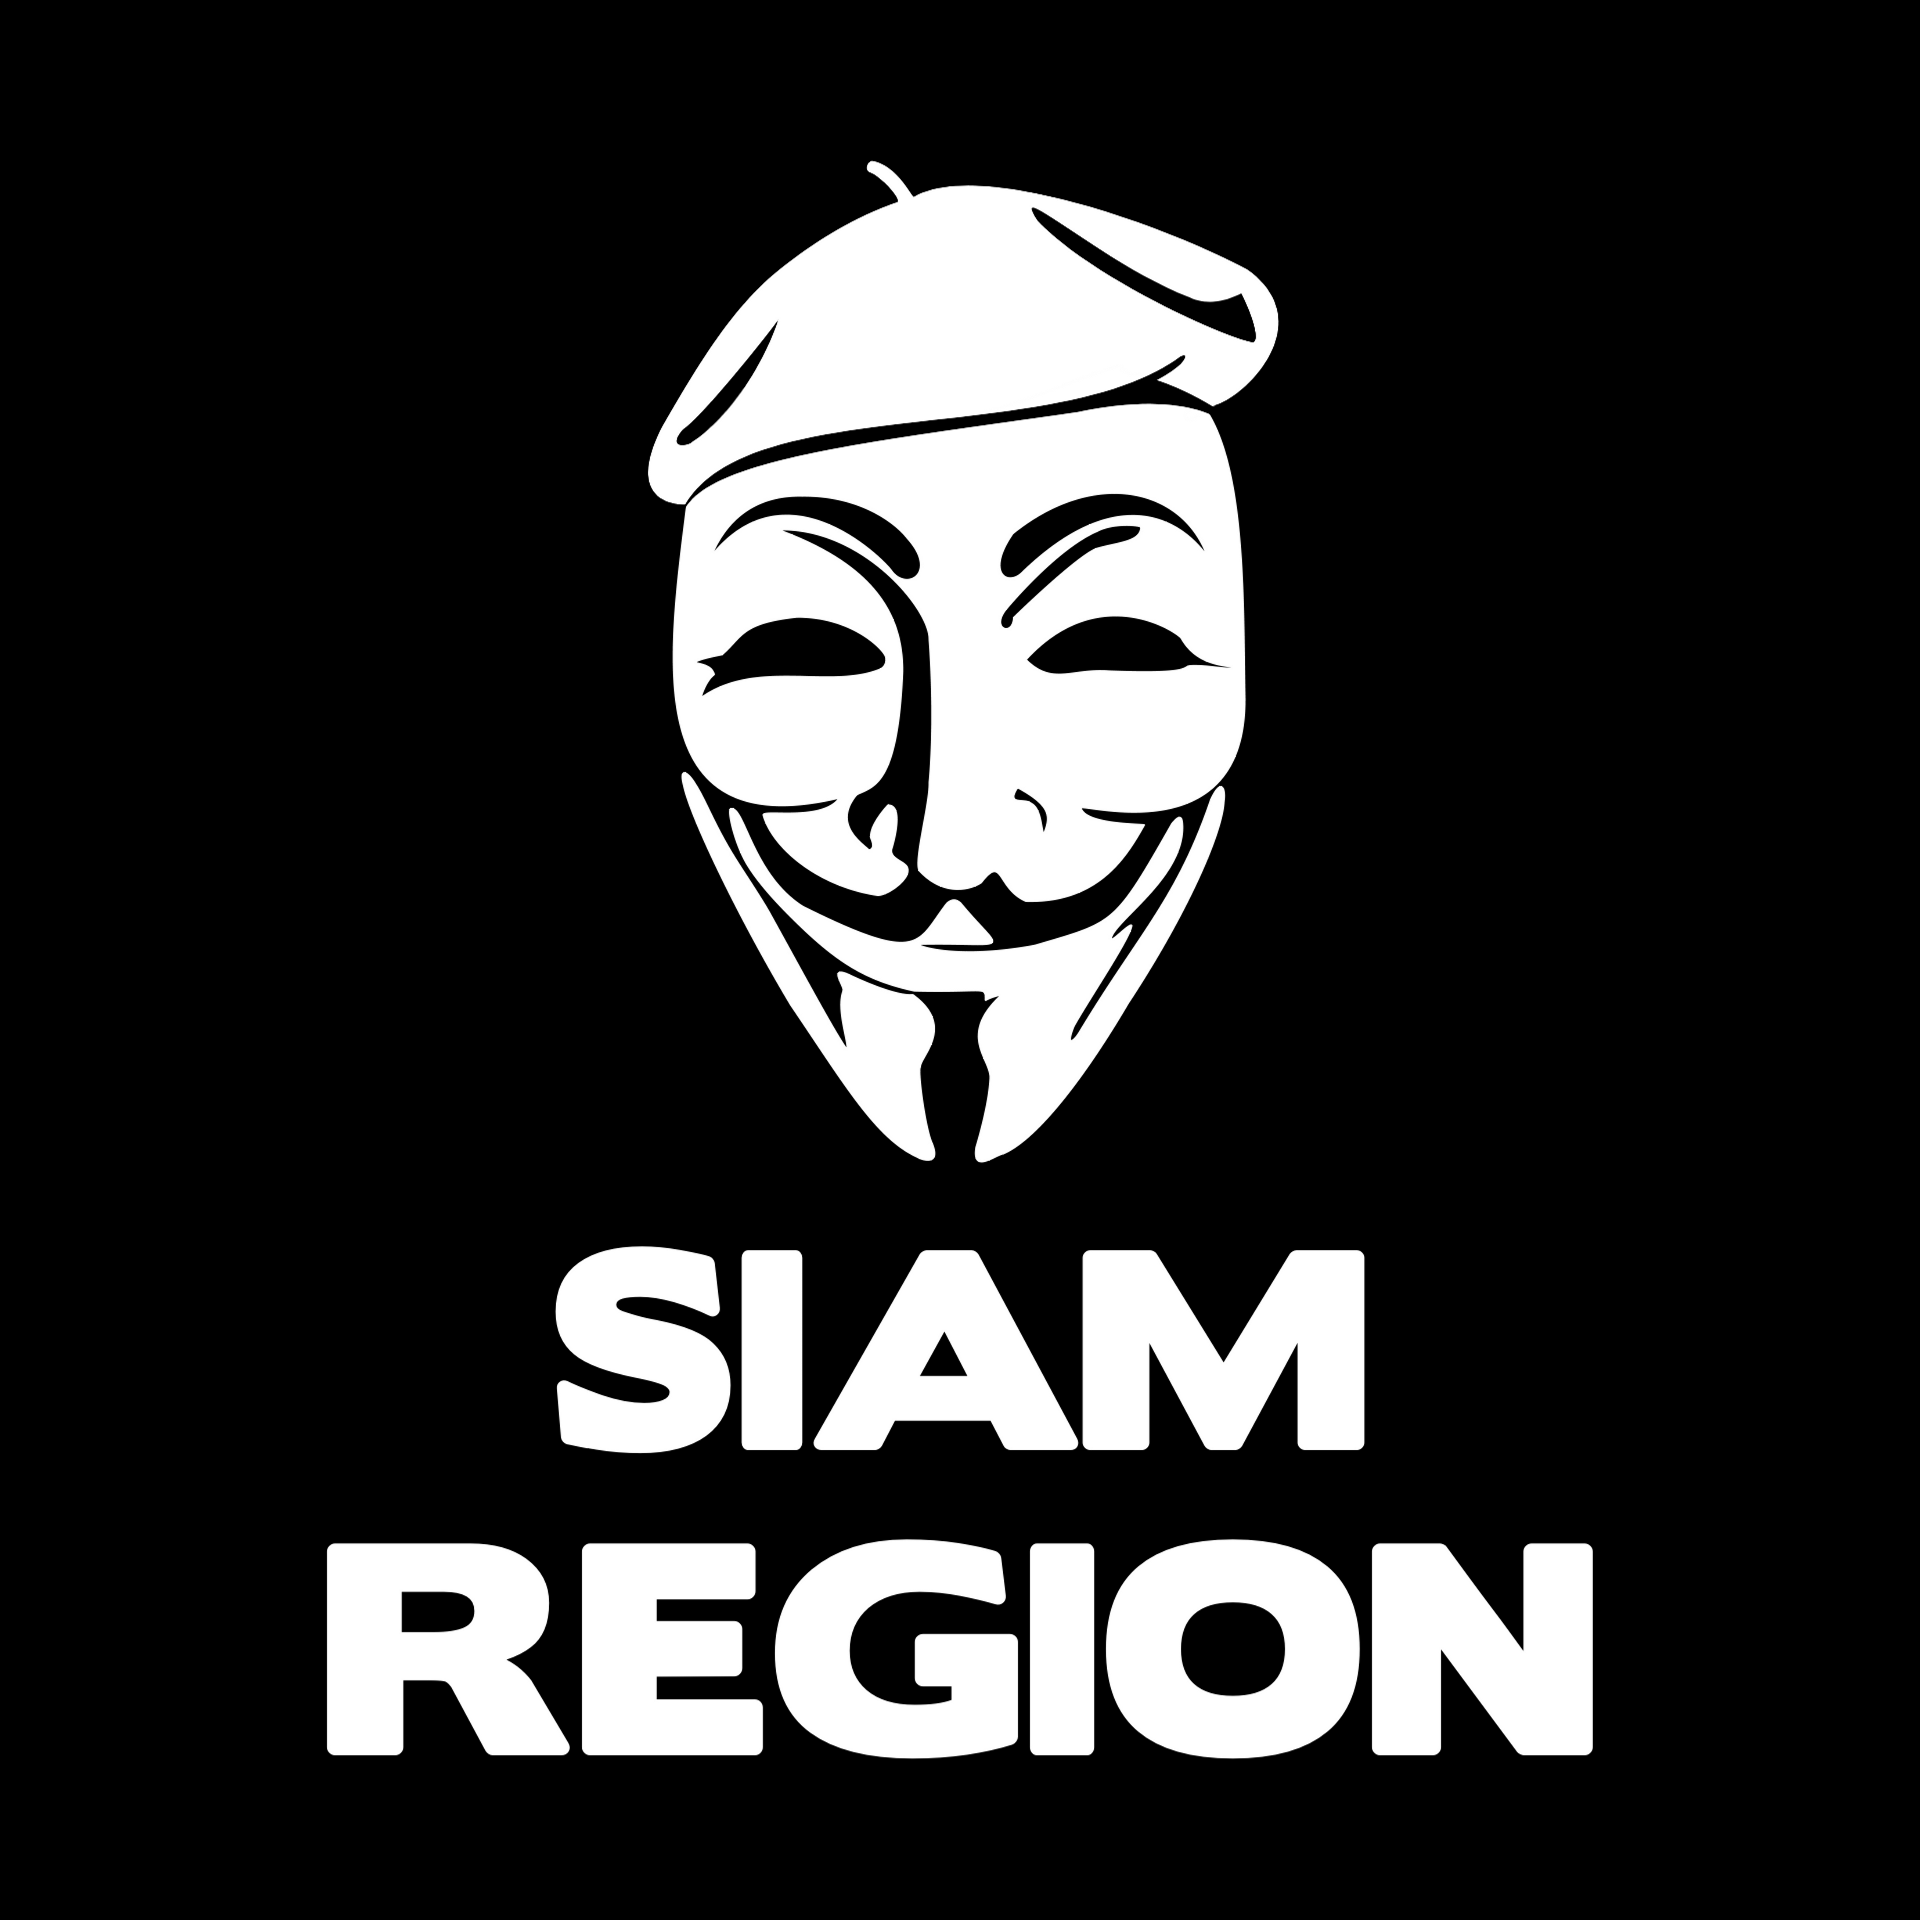 Siam Region